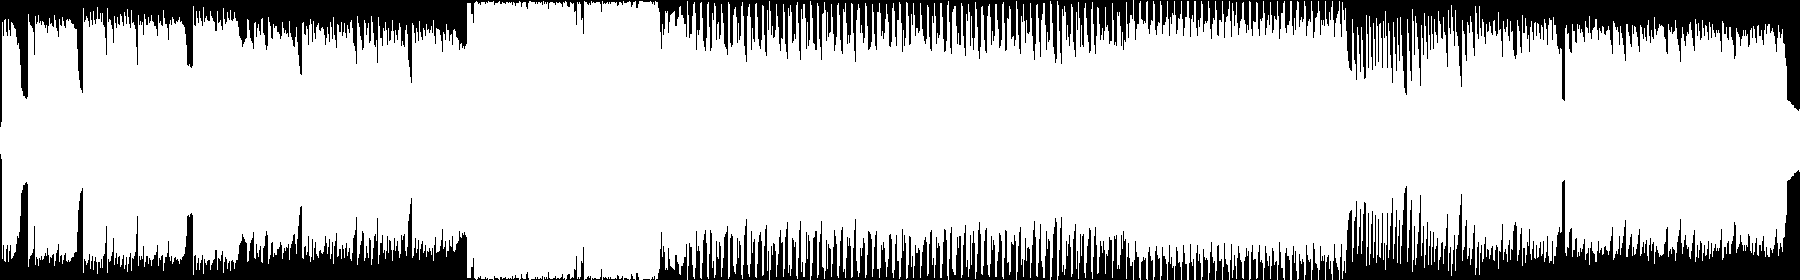 EDM Sylenth Kings audio waveform